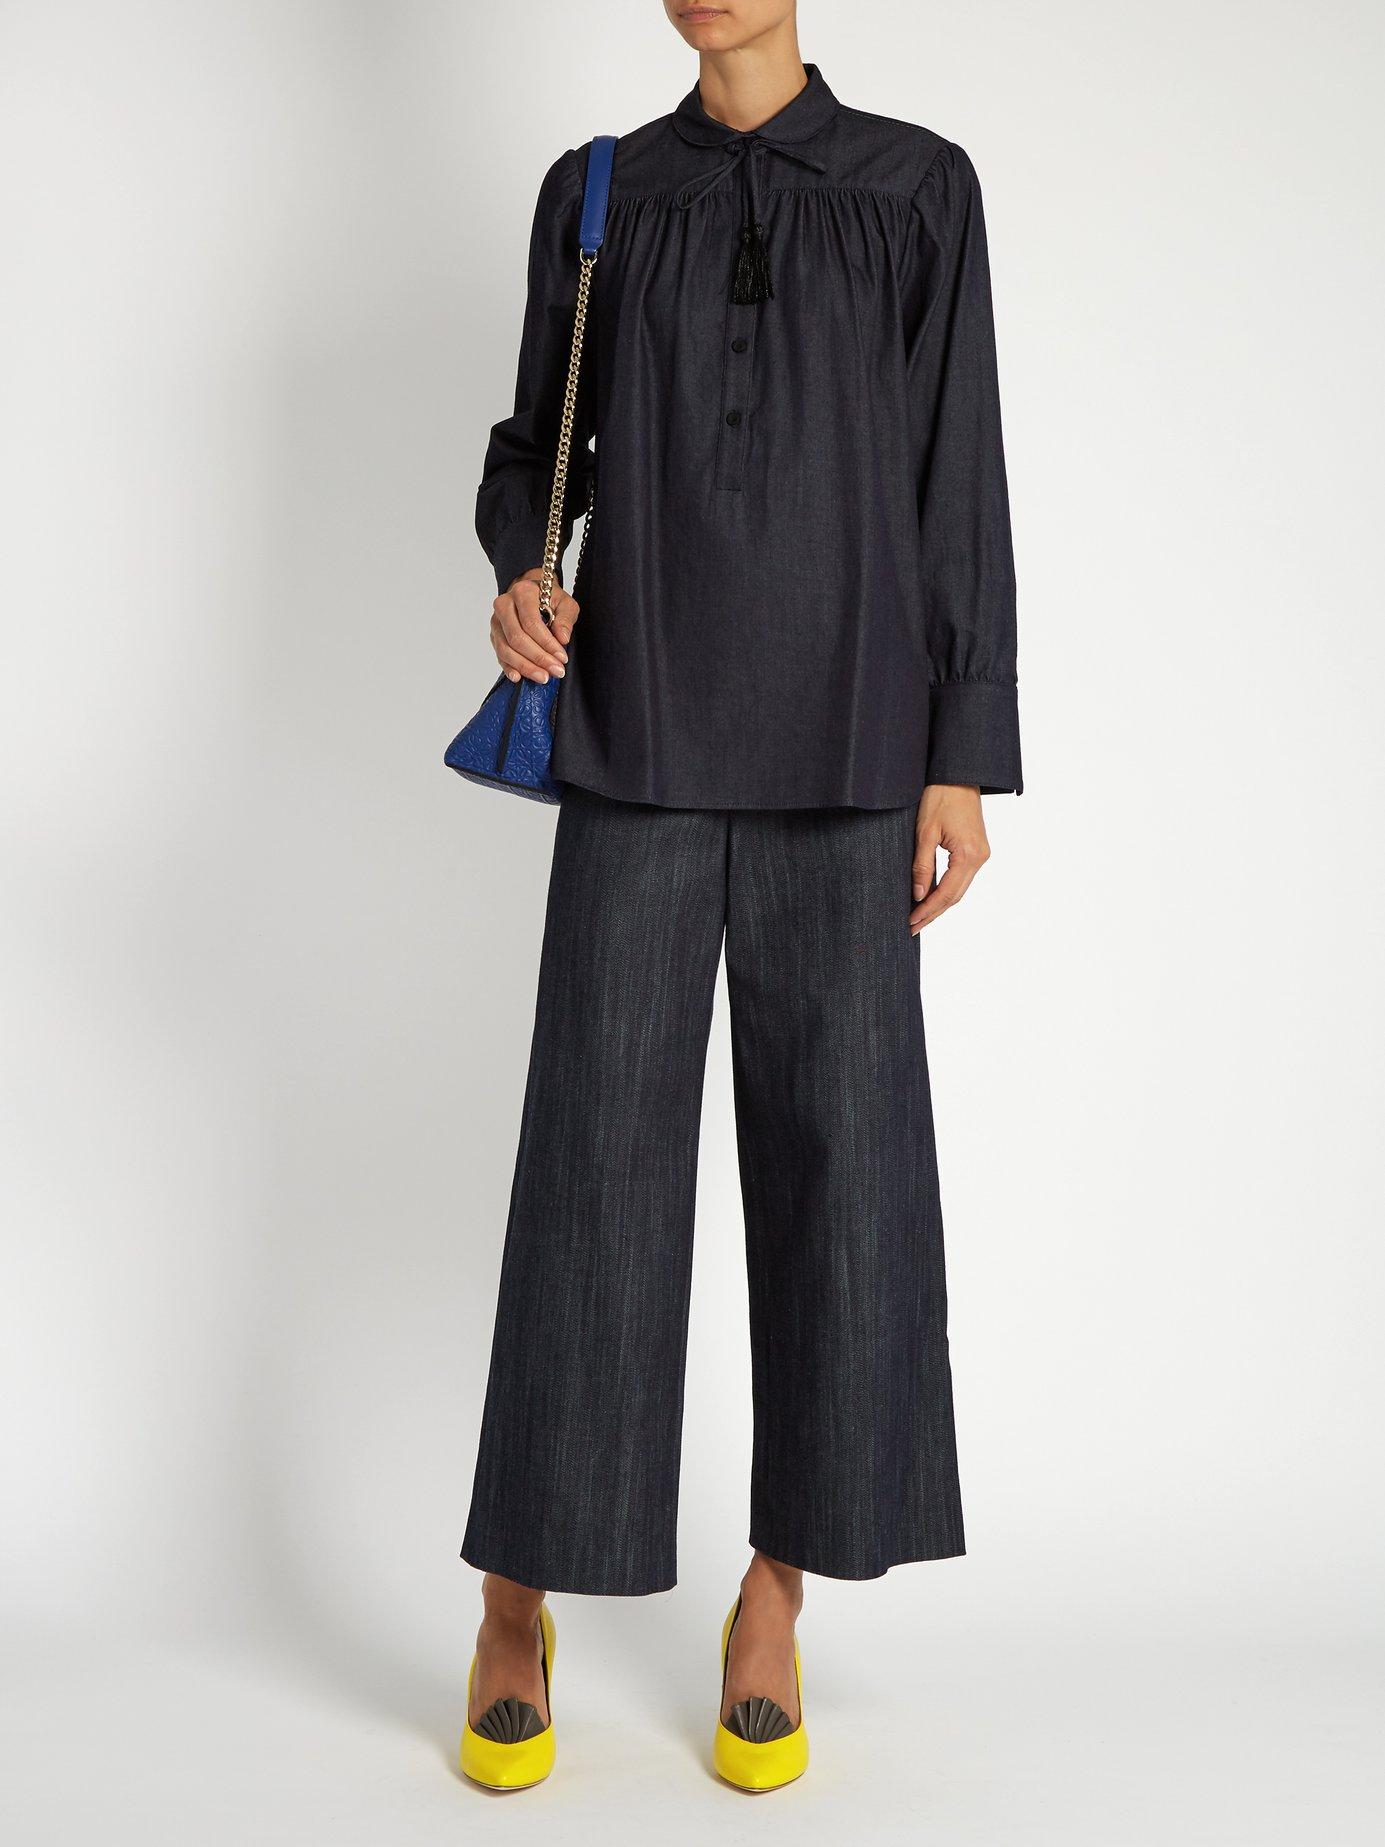 Blouson-sleeved denim blouse by Adam Lippes